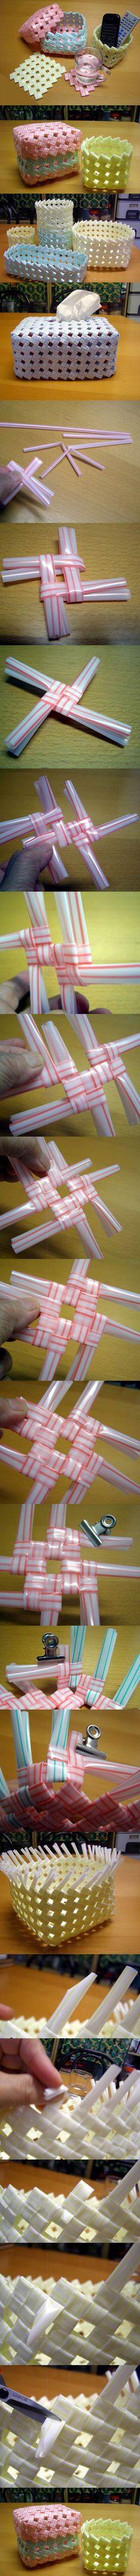 DIY Woven Straw Storage Baskets 2